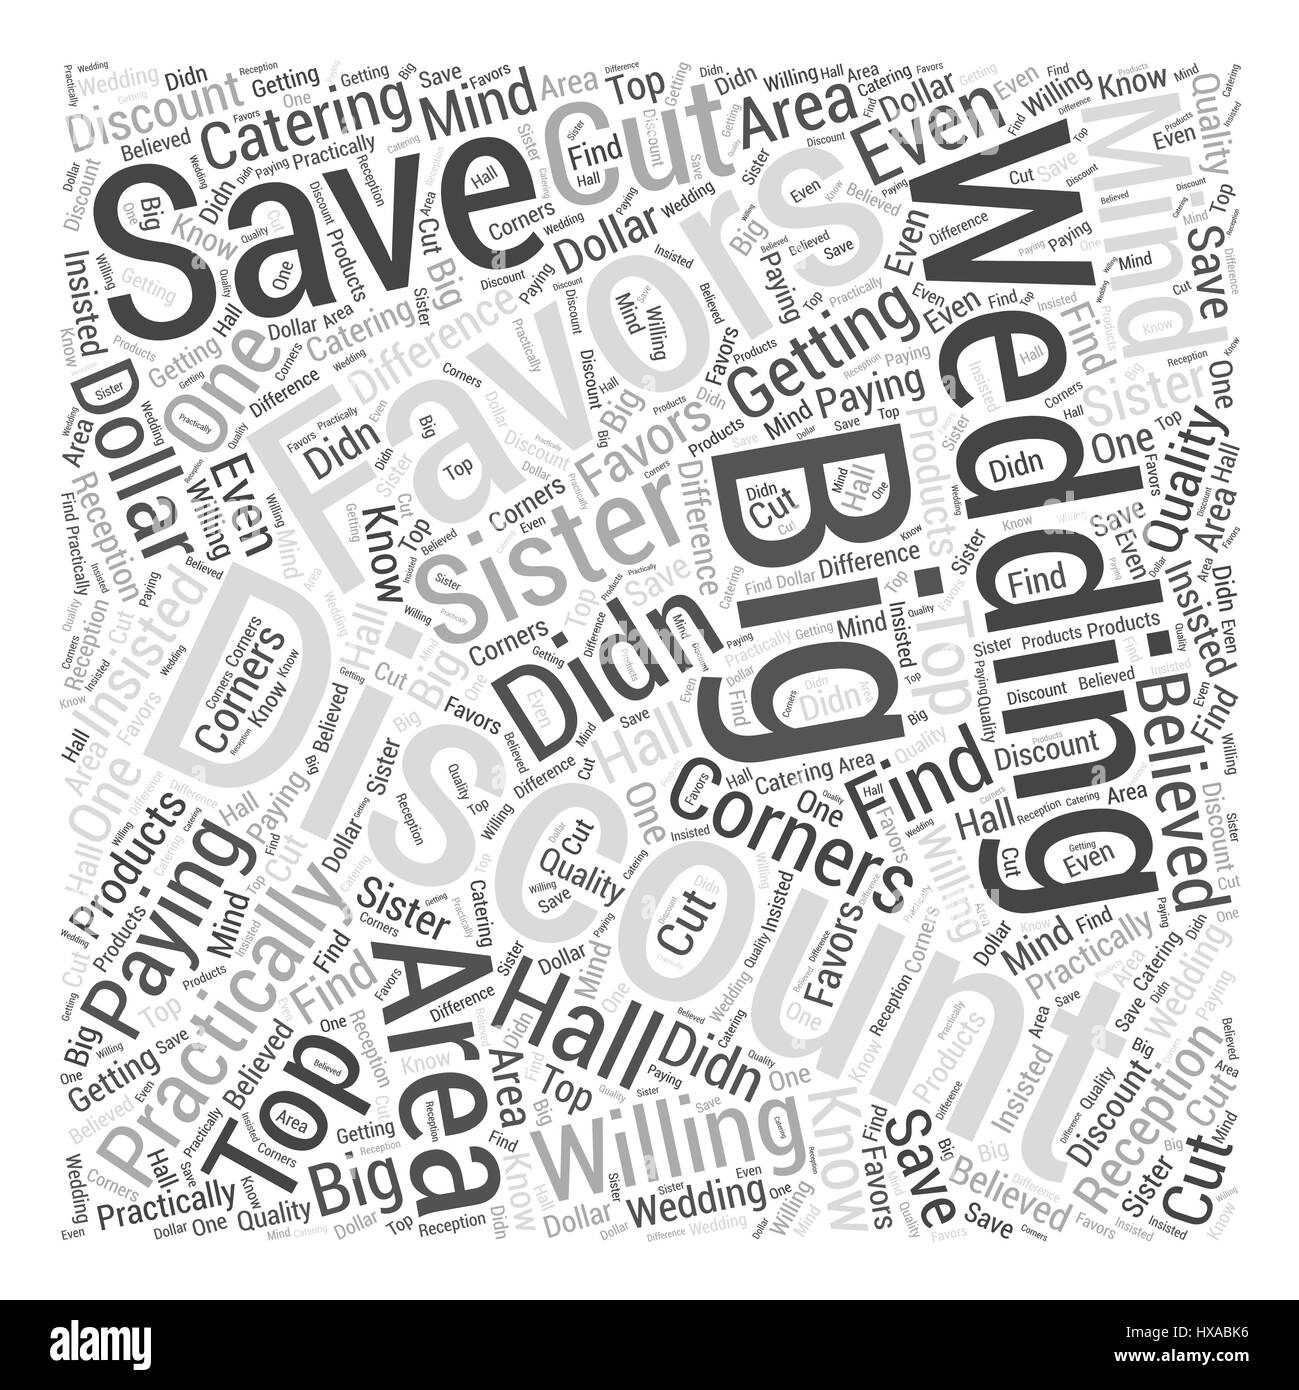 Rabatt Hochzeitsbevorzugungen Word Cloud Konzept Vektor Abbildung